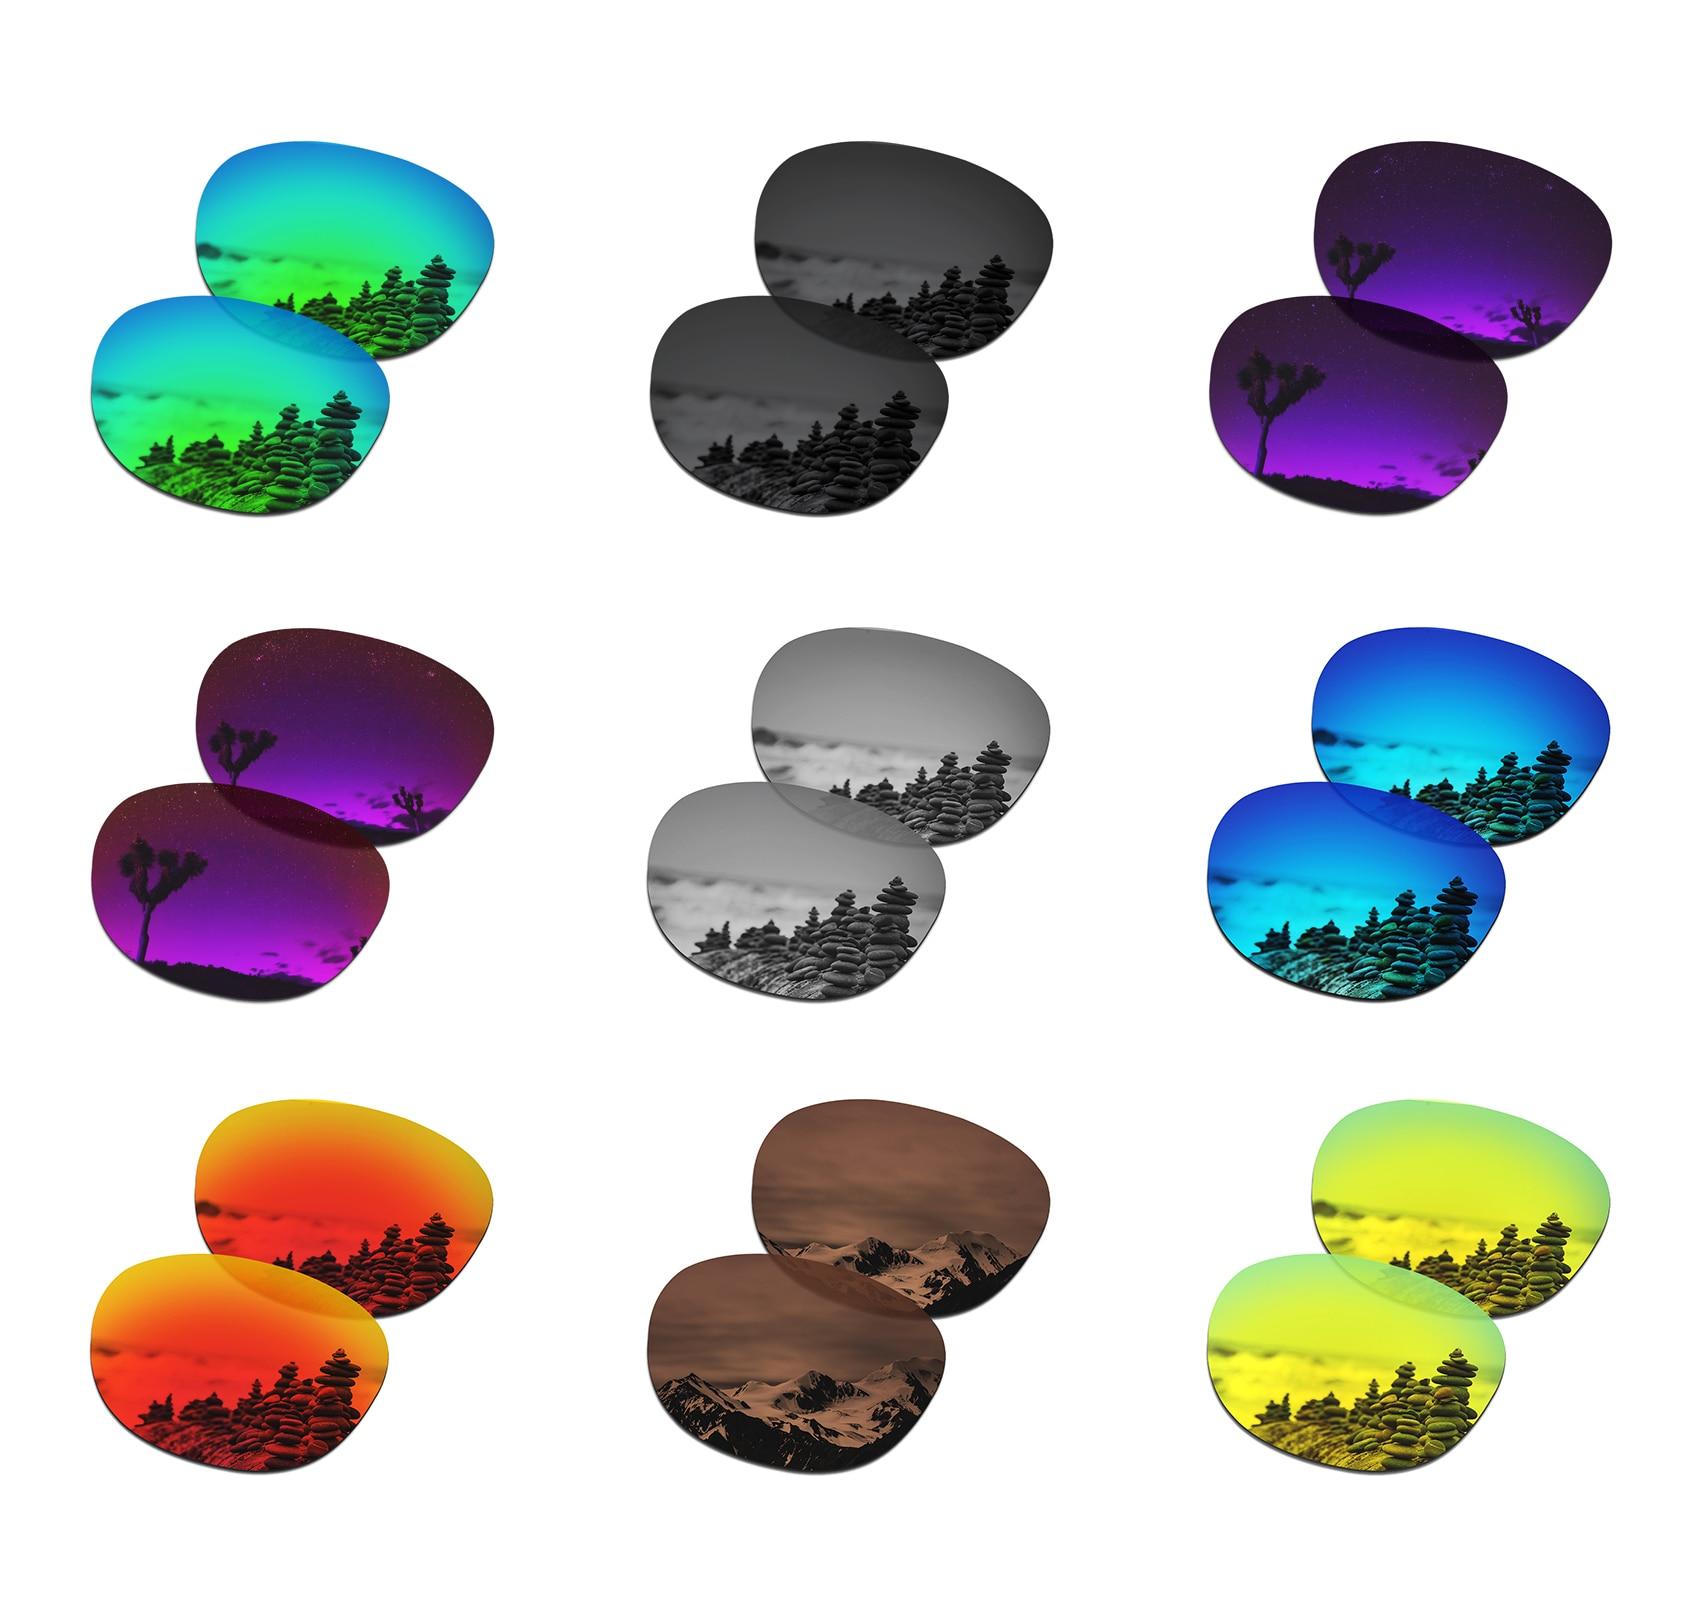 SmartVLT Polarized Replacement Lenses For Oakley Garage Rock Sunglasses - Multiple Options